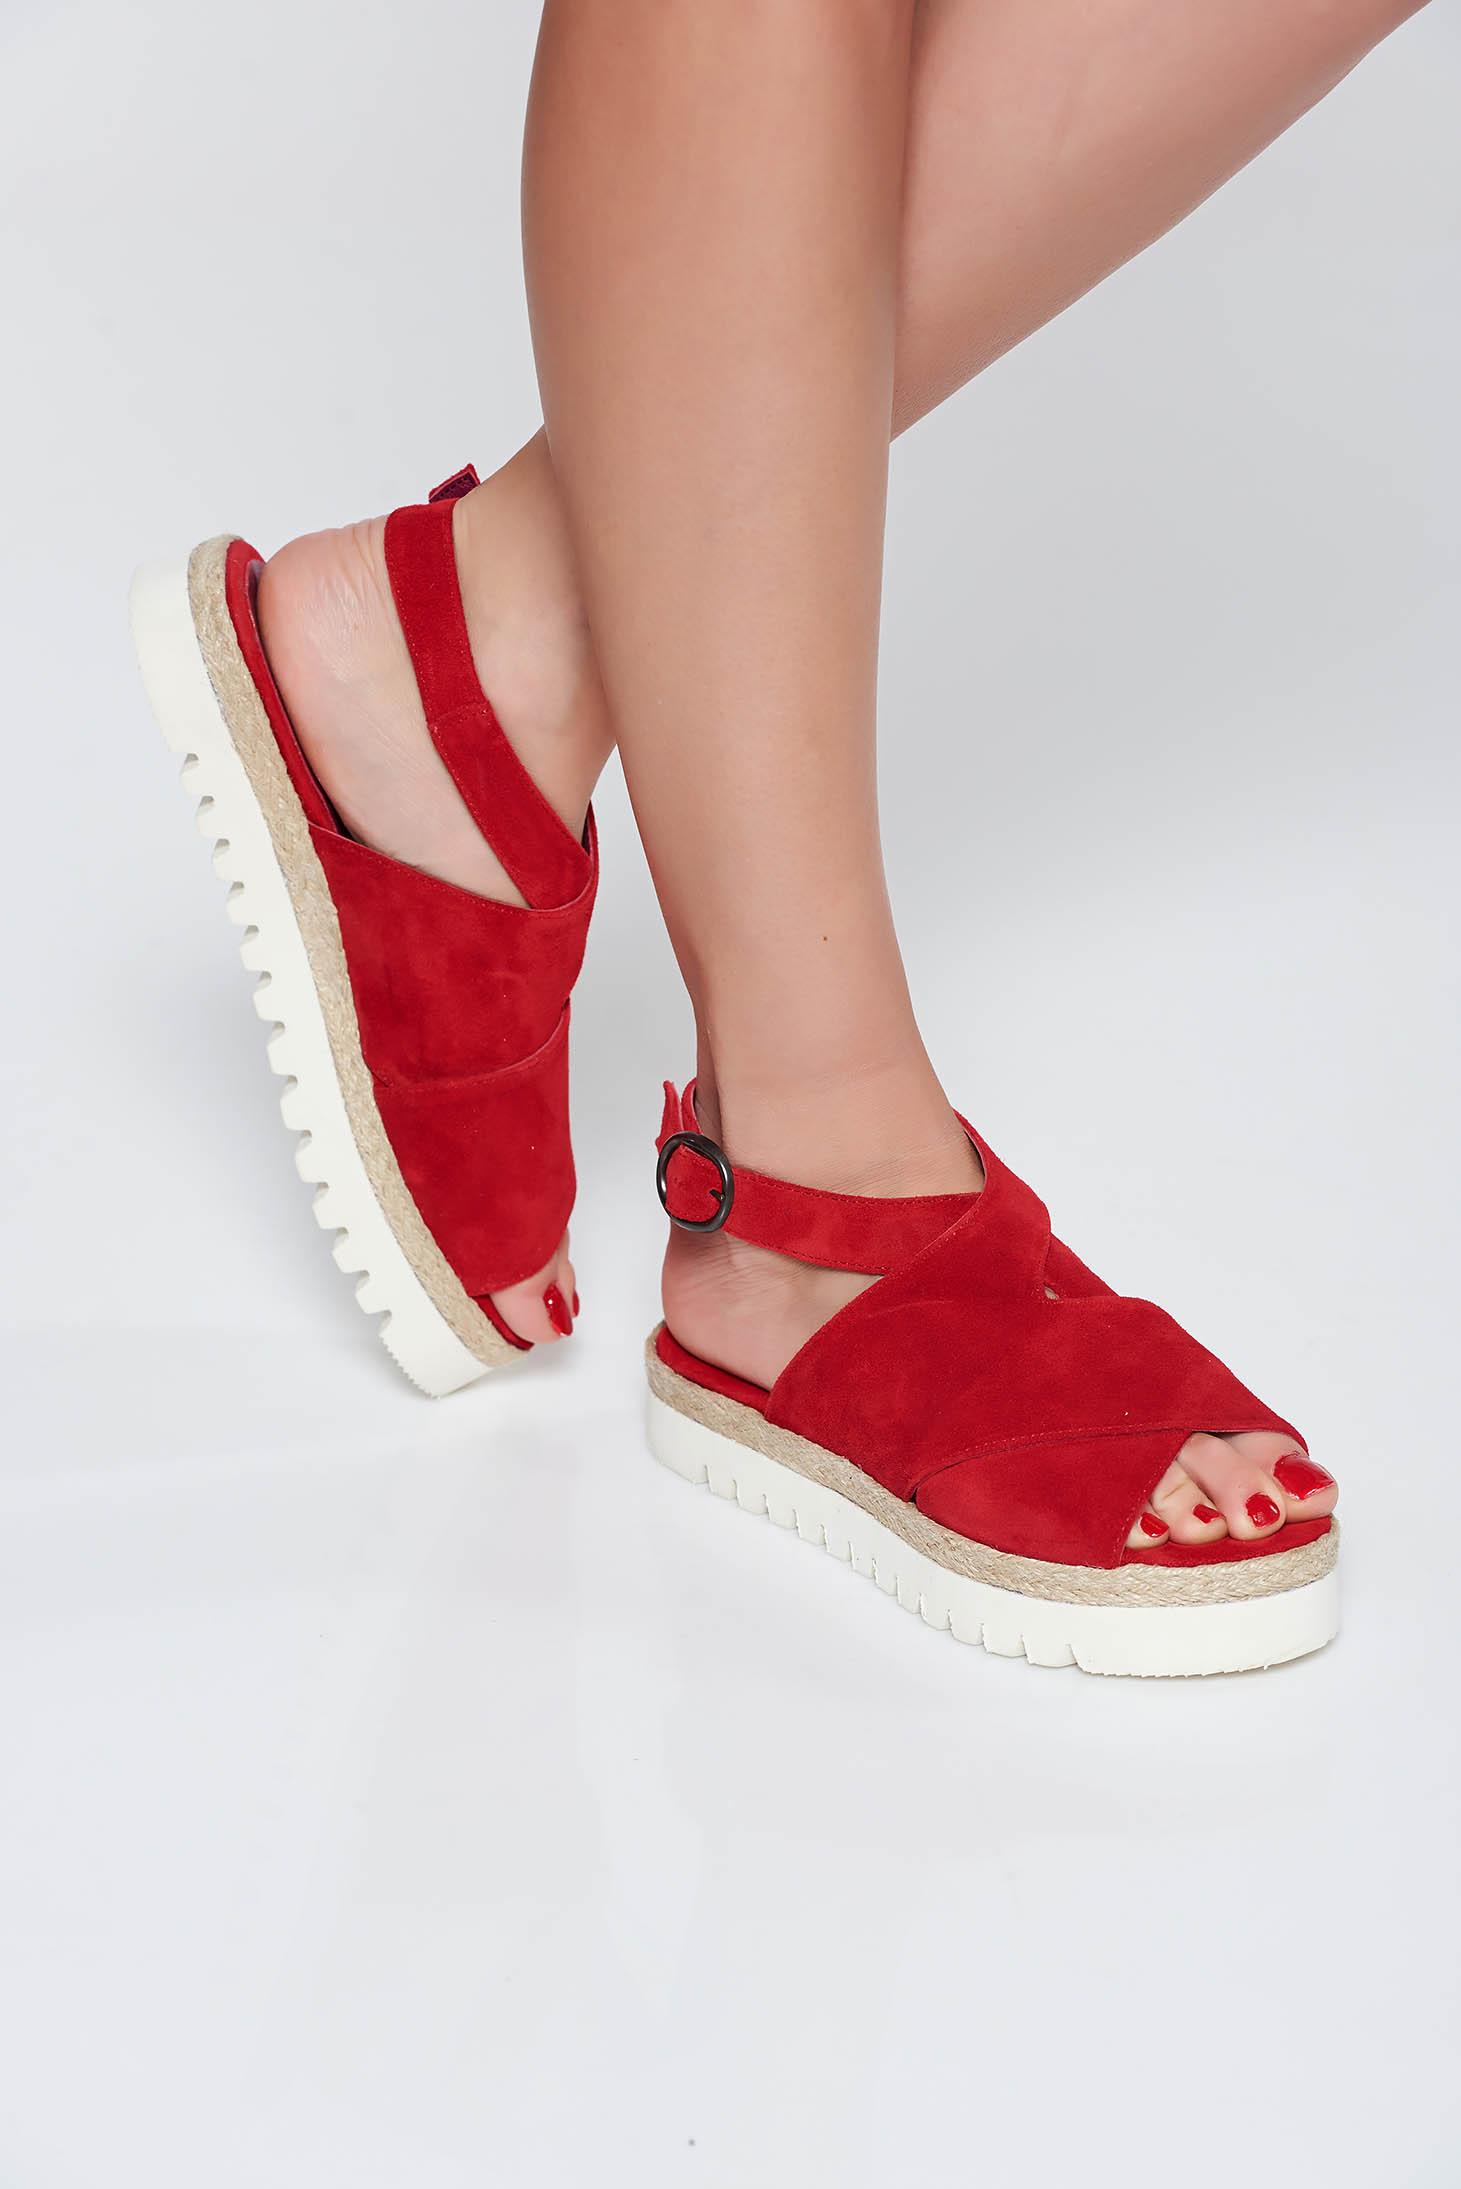 Sandale StarShinerS rosii casual din piele naturala cu talpa joasa si usoara